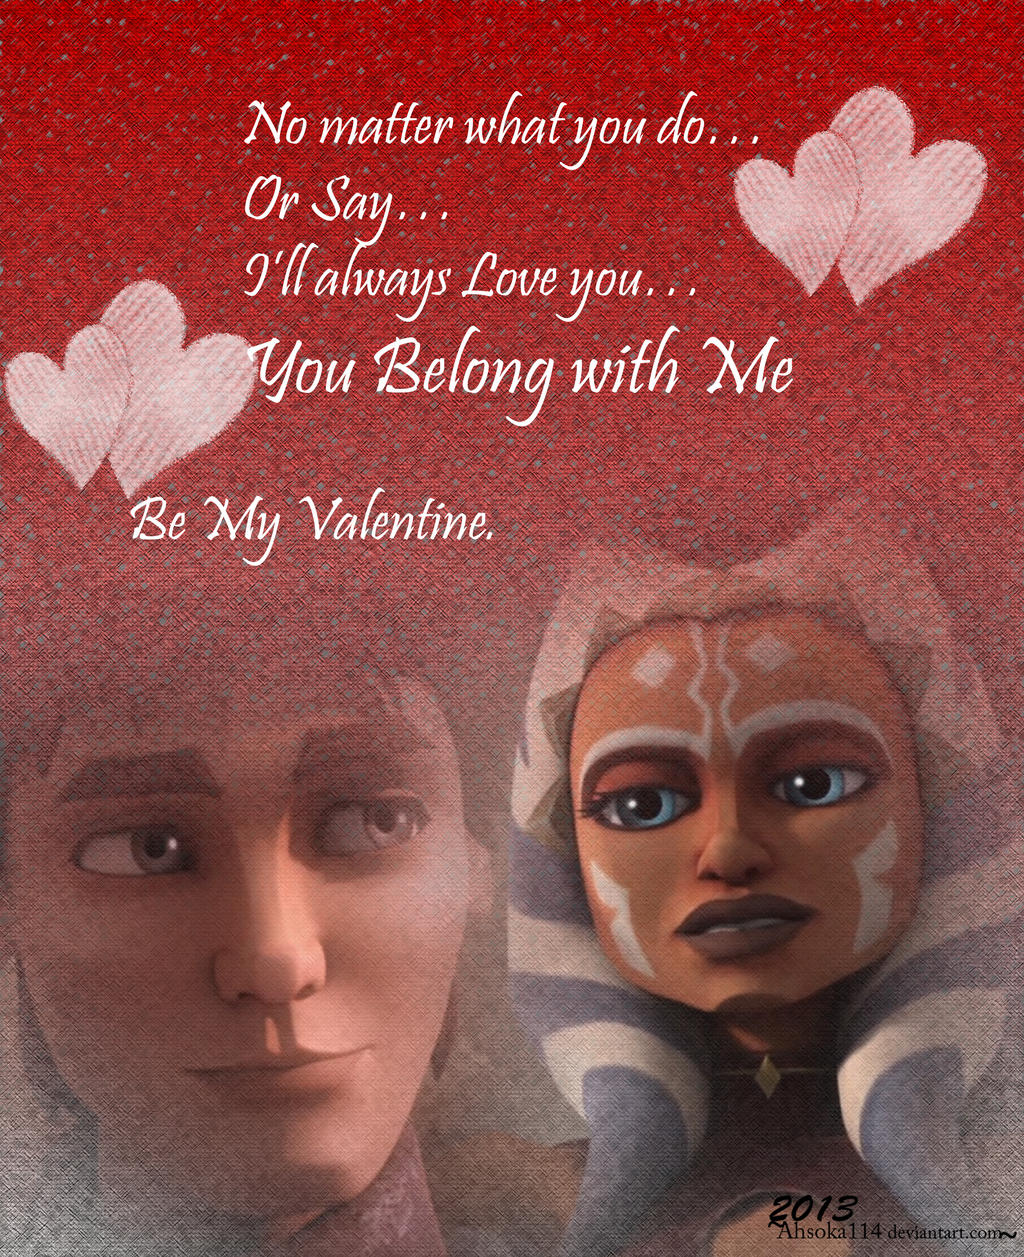 You Belong with Me-LuxSoka Valentine by Ahsoka114